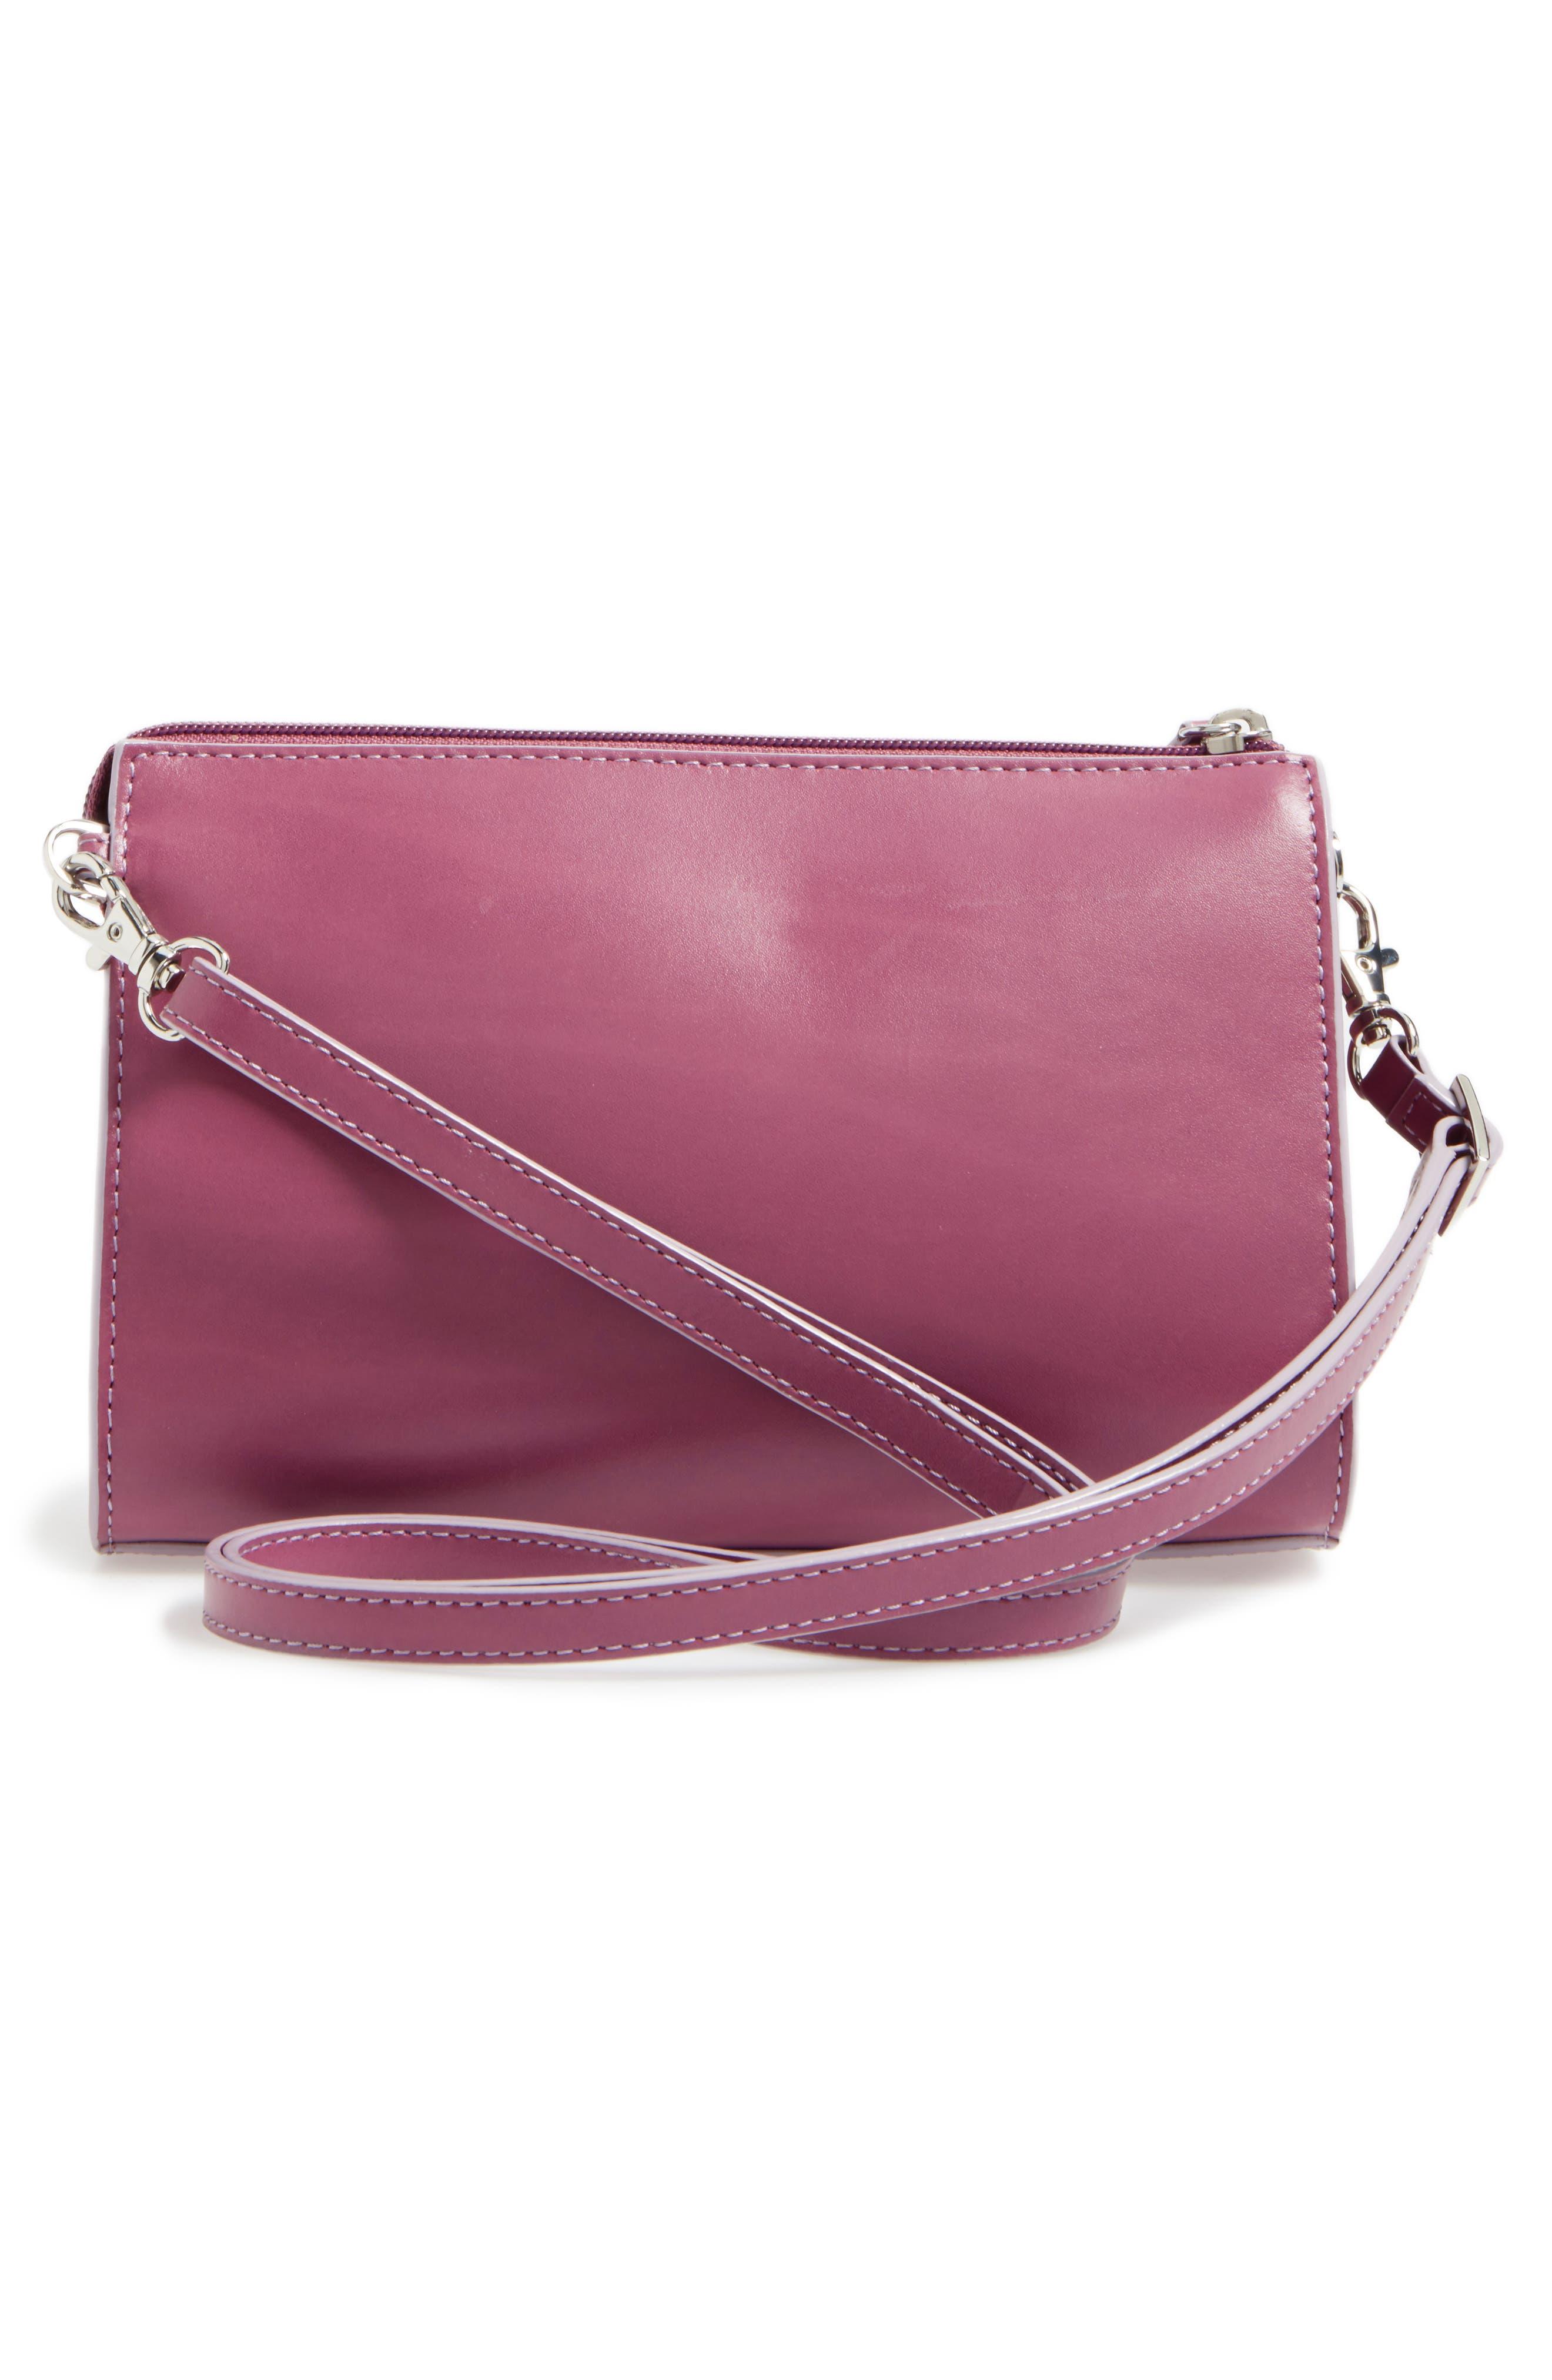 Lodis'Audrey Collection -Vicky' ConvertibleCrossbody Bag,                             Alternate thumbnail 22, color,